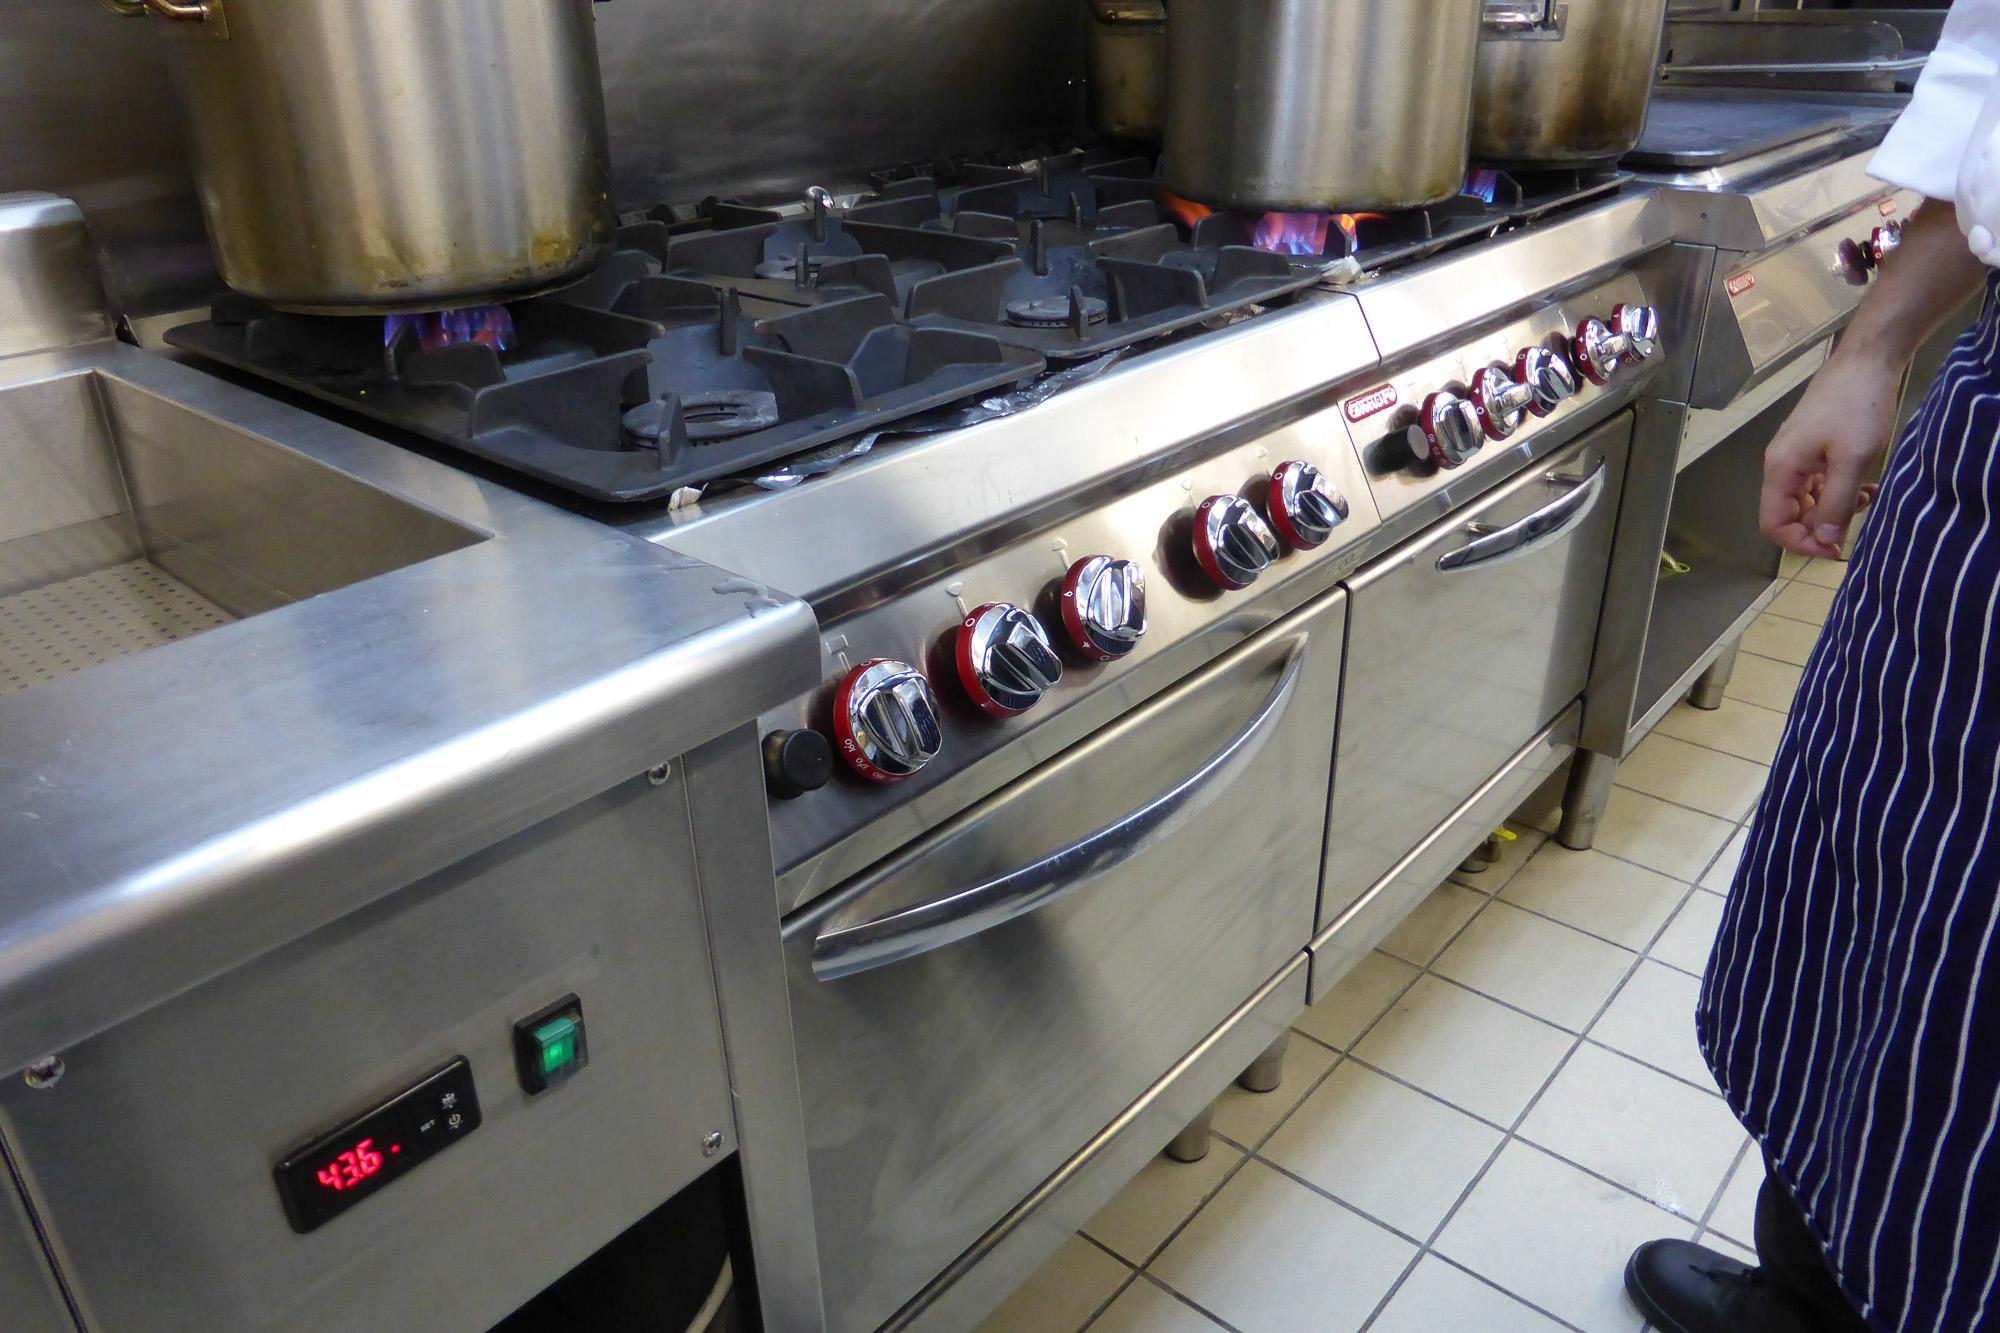 Italia_kitchen_gusto_anantara-4